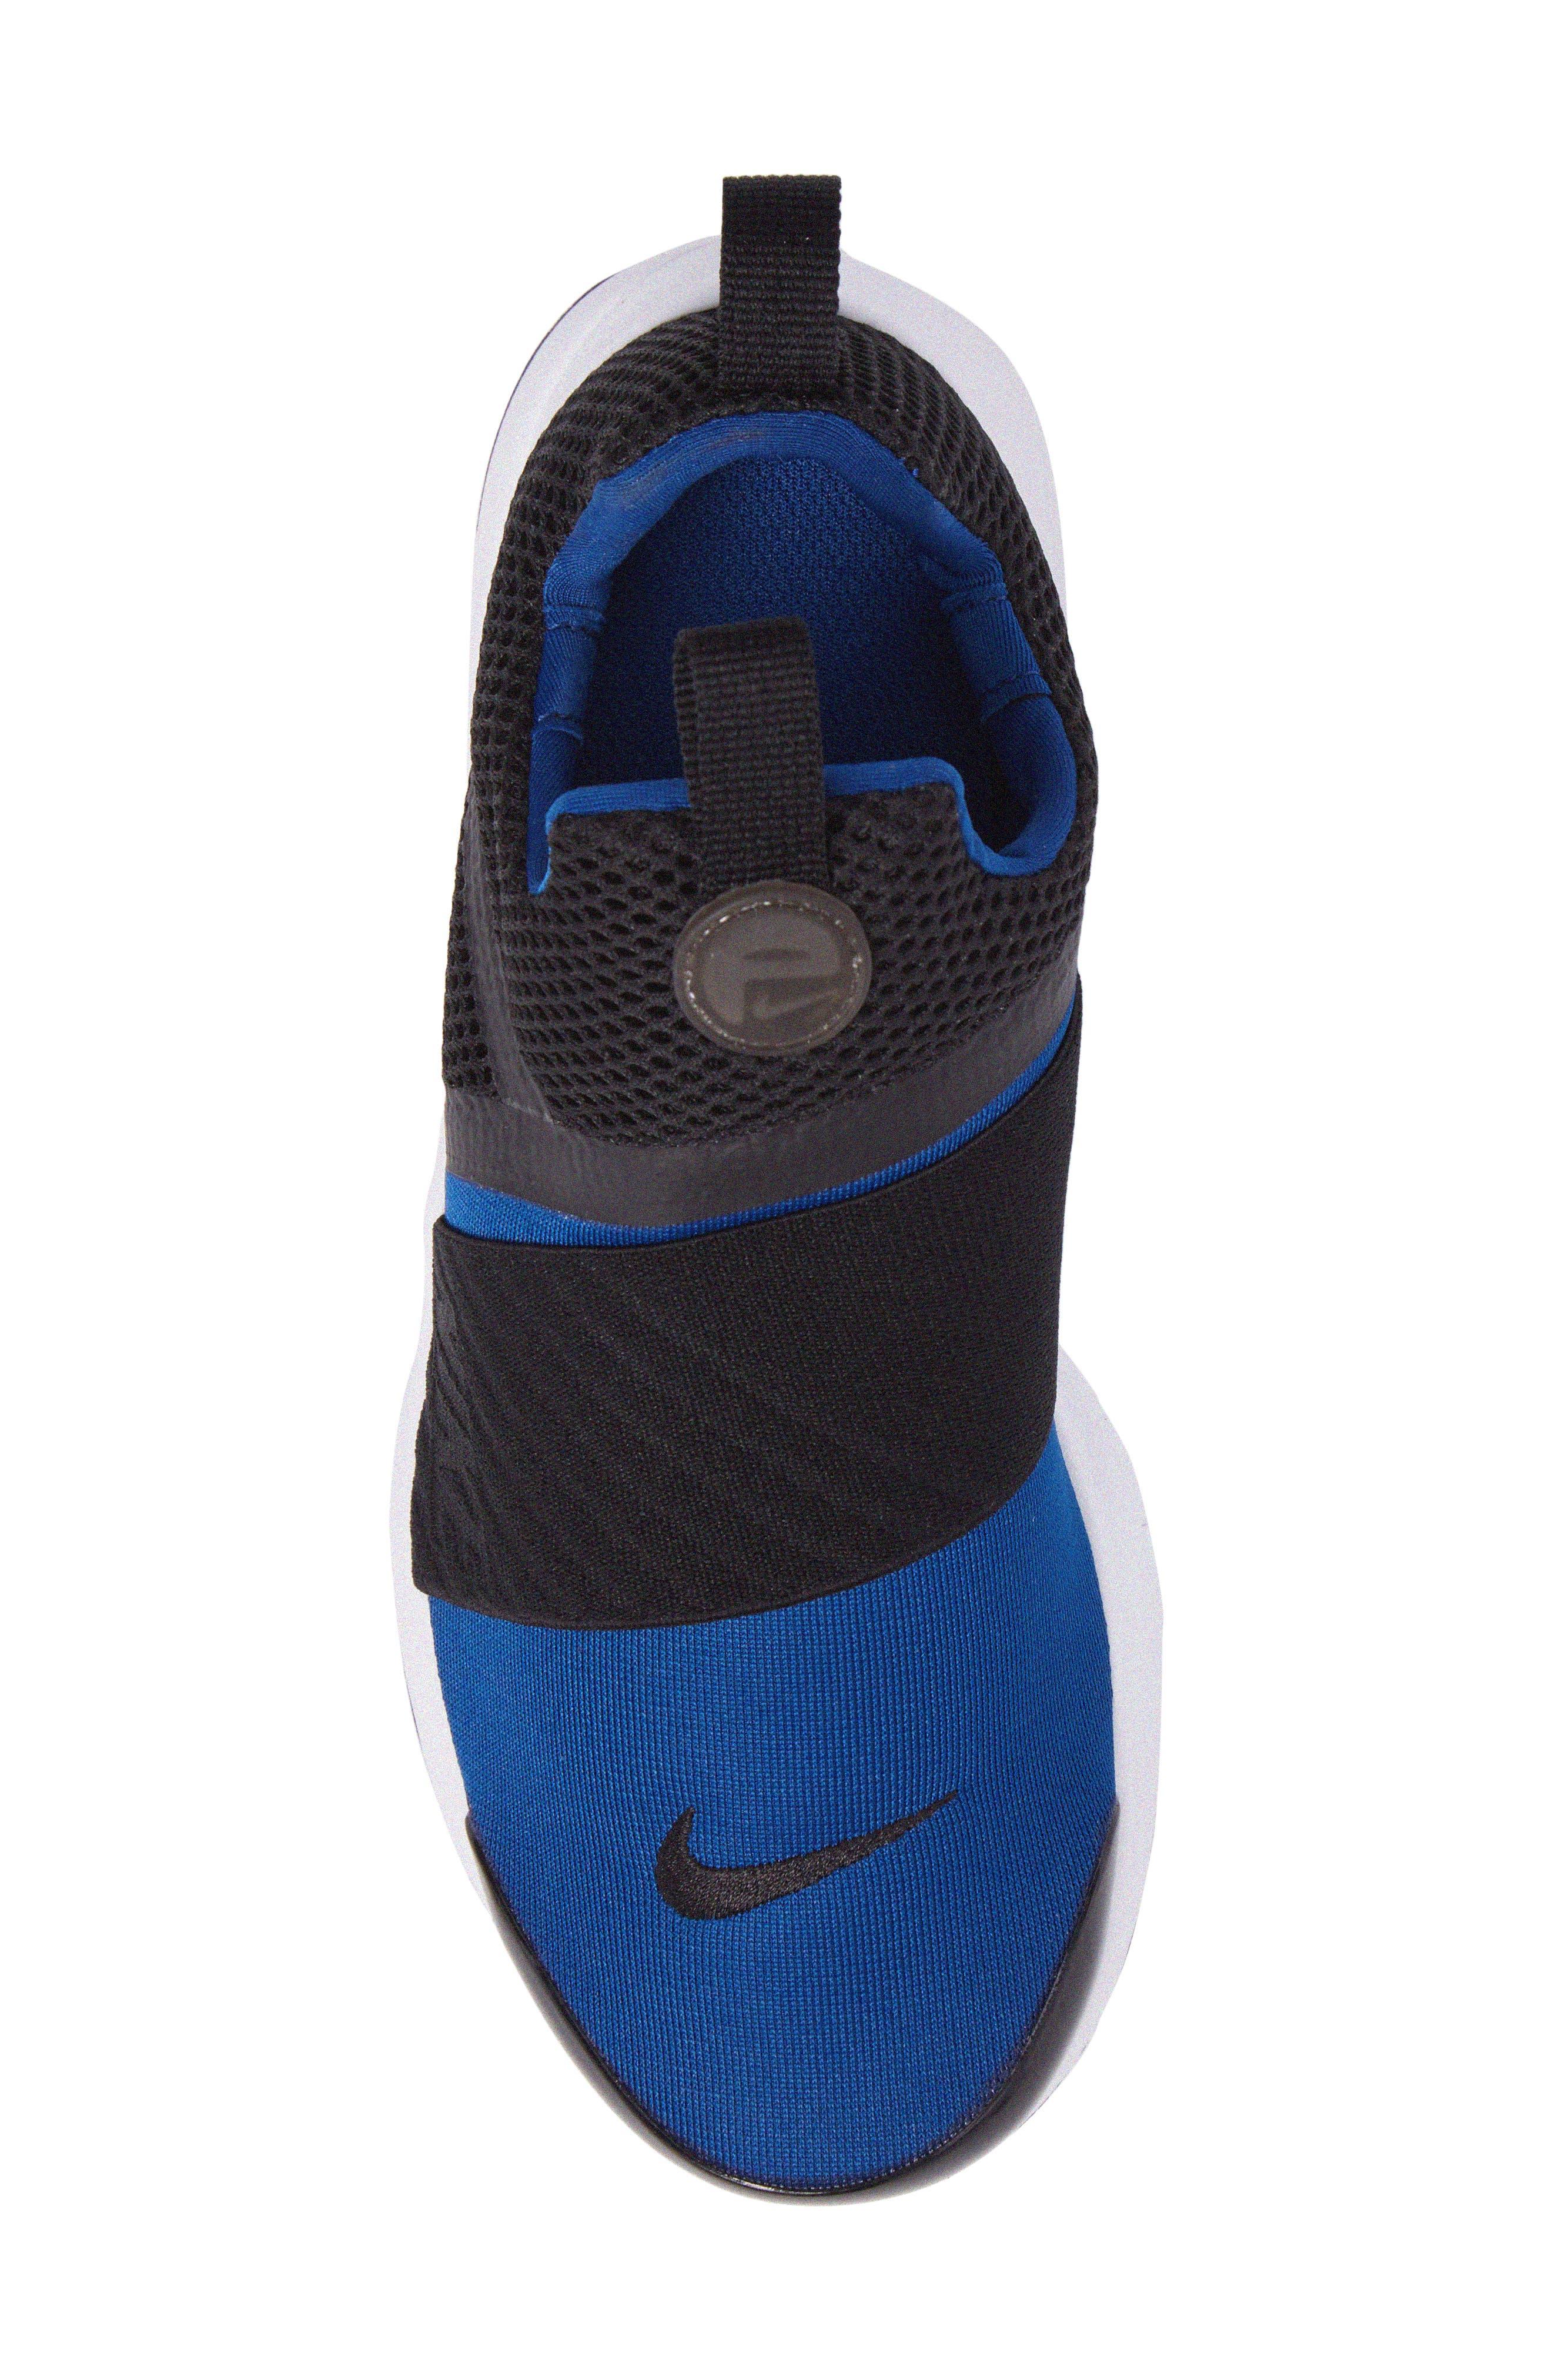 Presto Extreme Sneaker,                             Alternate thumbnail 53, color,